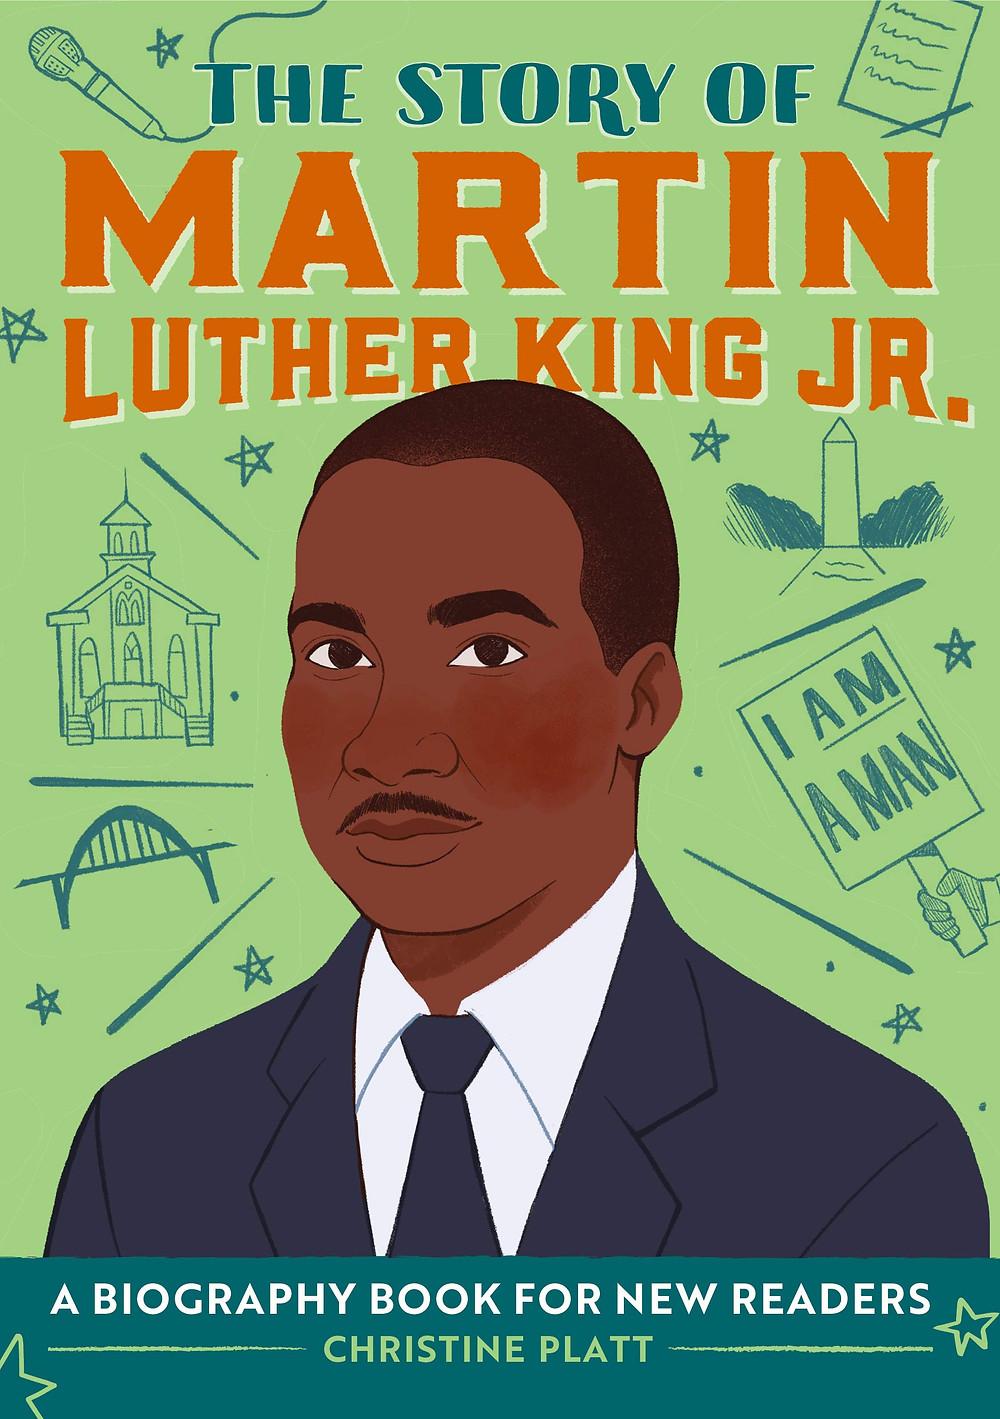 Christine Platt the story of Martin Luther King Jr